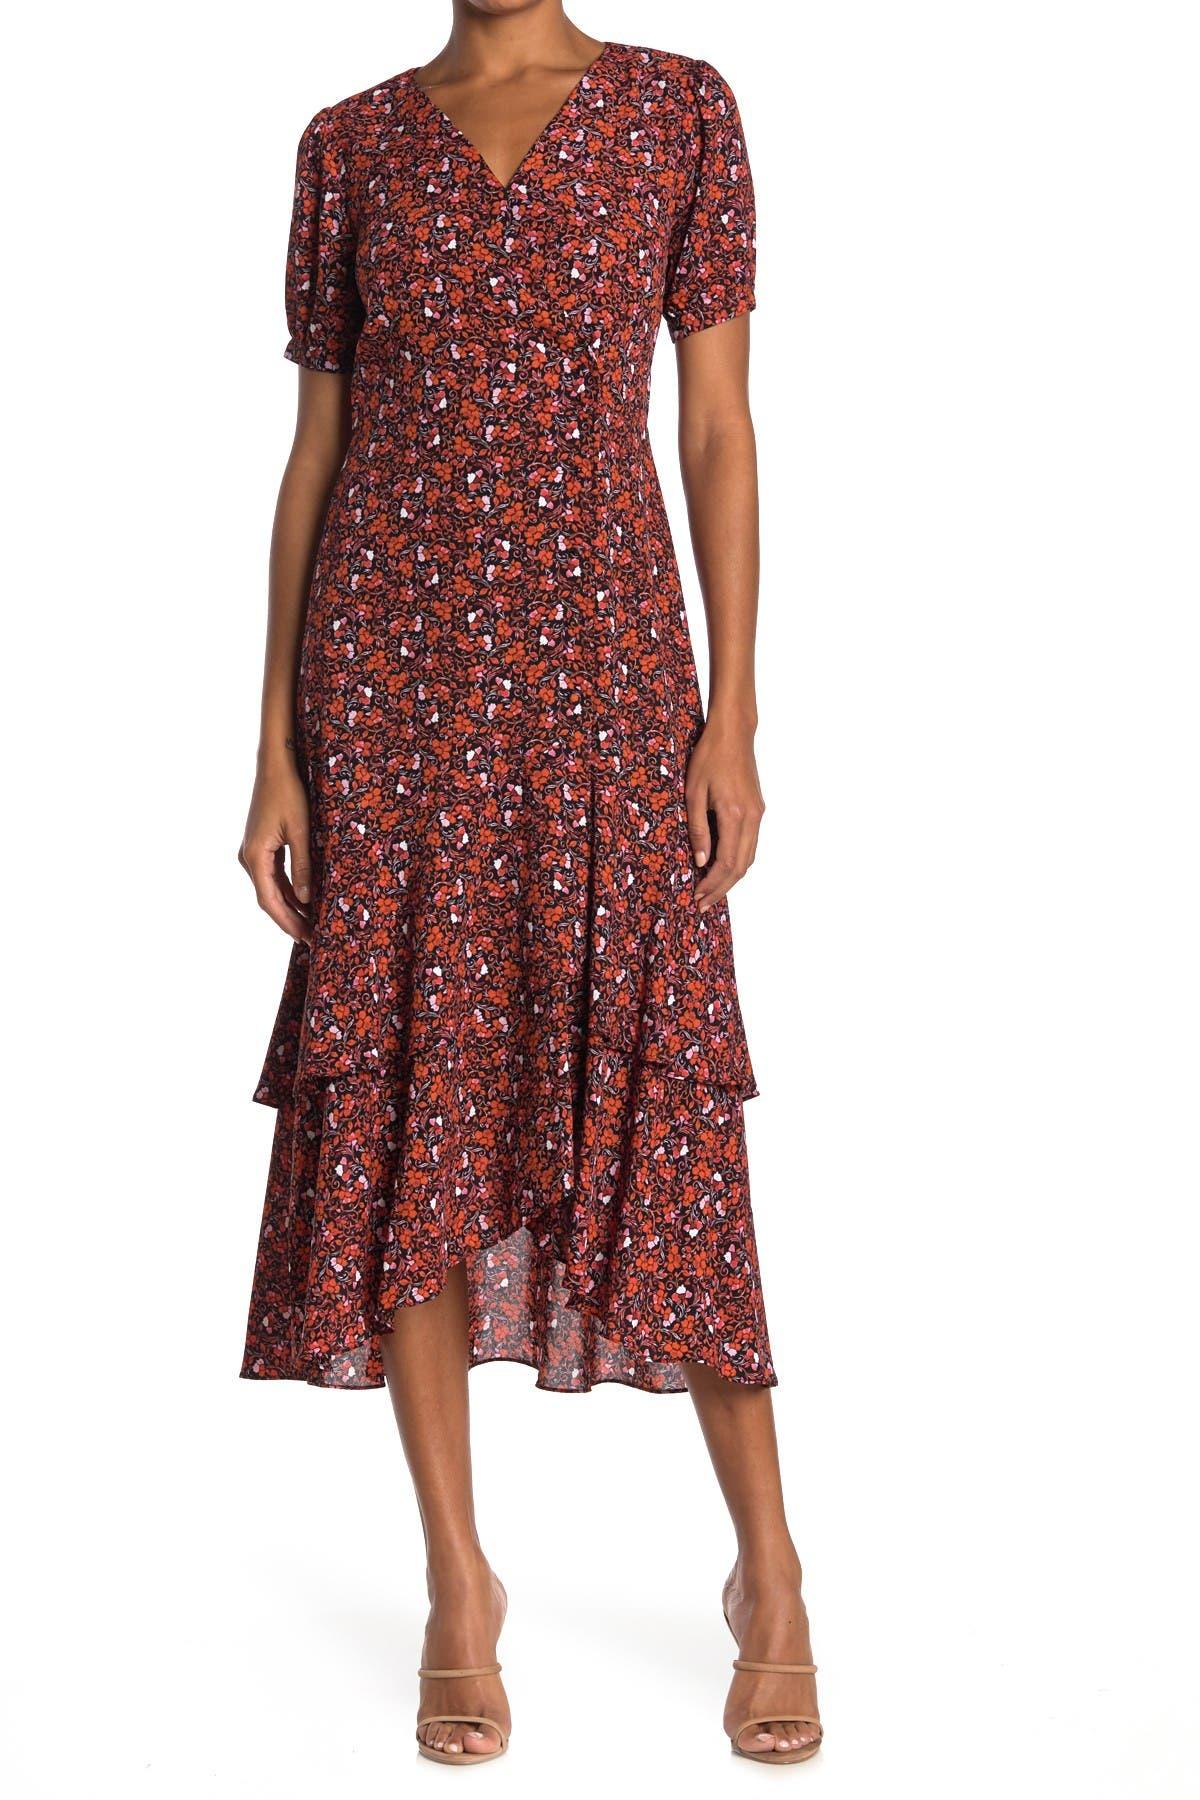 Image of NANETTE nanette lepore Floral Puff Sleeve Wrap Dress